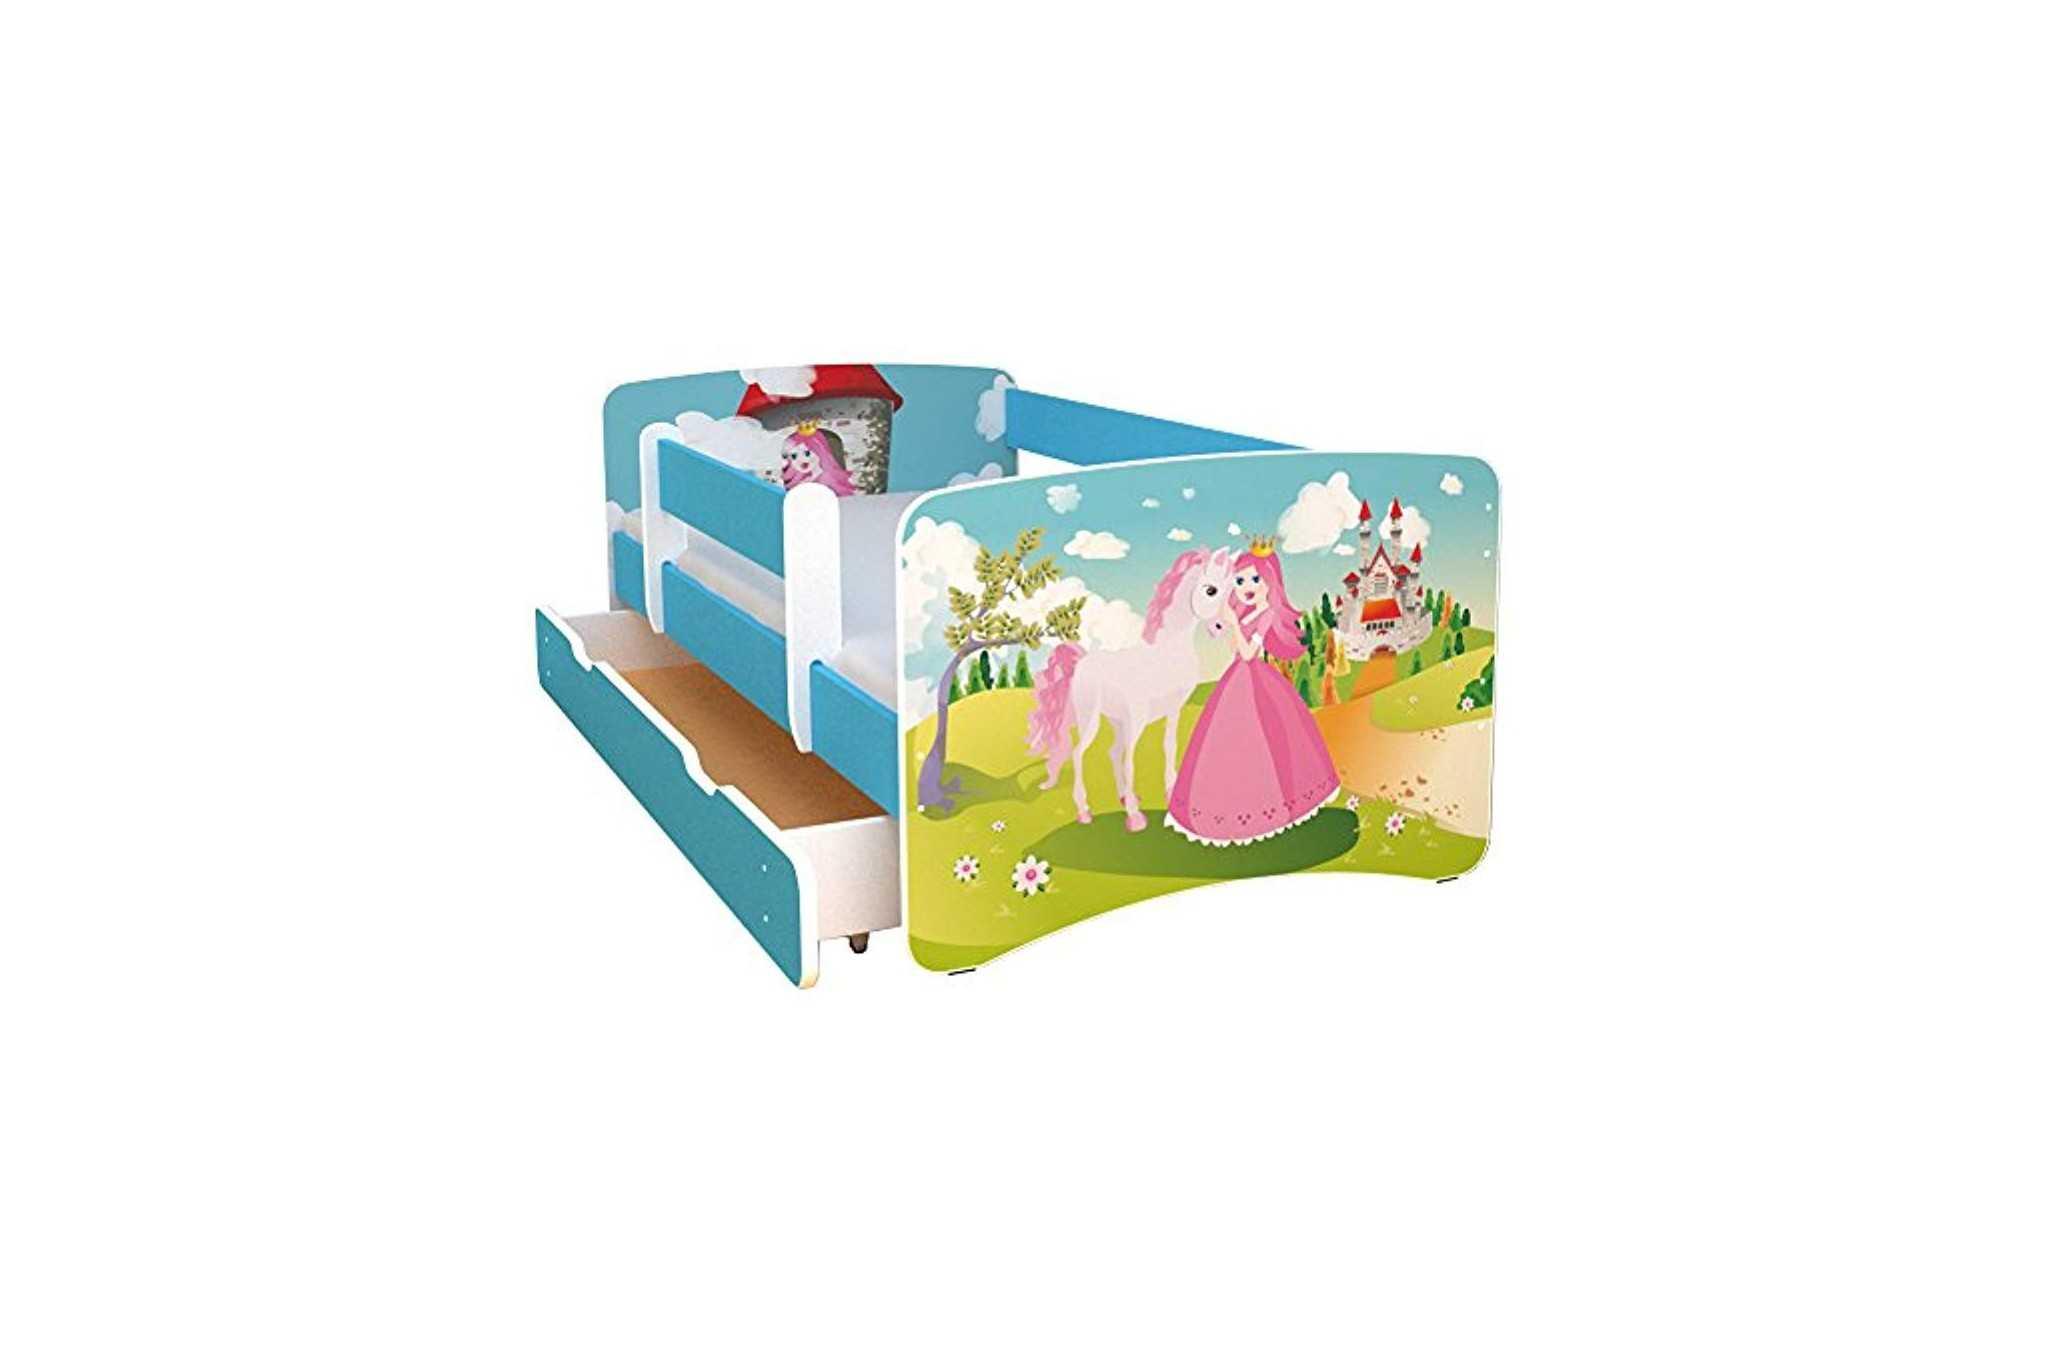 best for kids kinderbett 90x160 mit rausfallschutz bunte. Black Bedroom Furniture Sets. Home Design Ideas